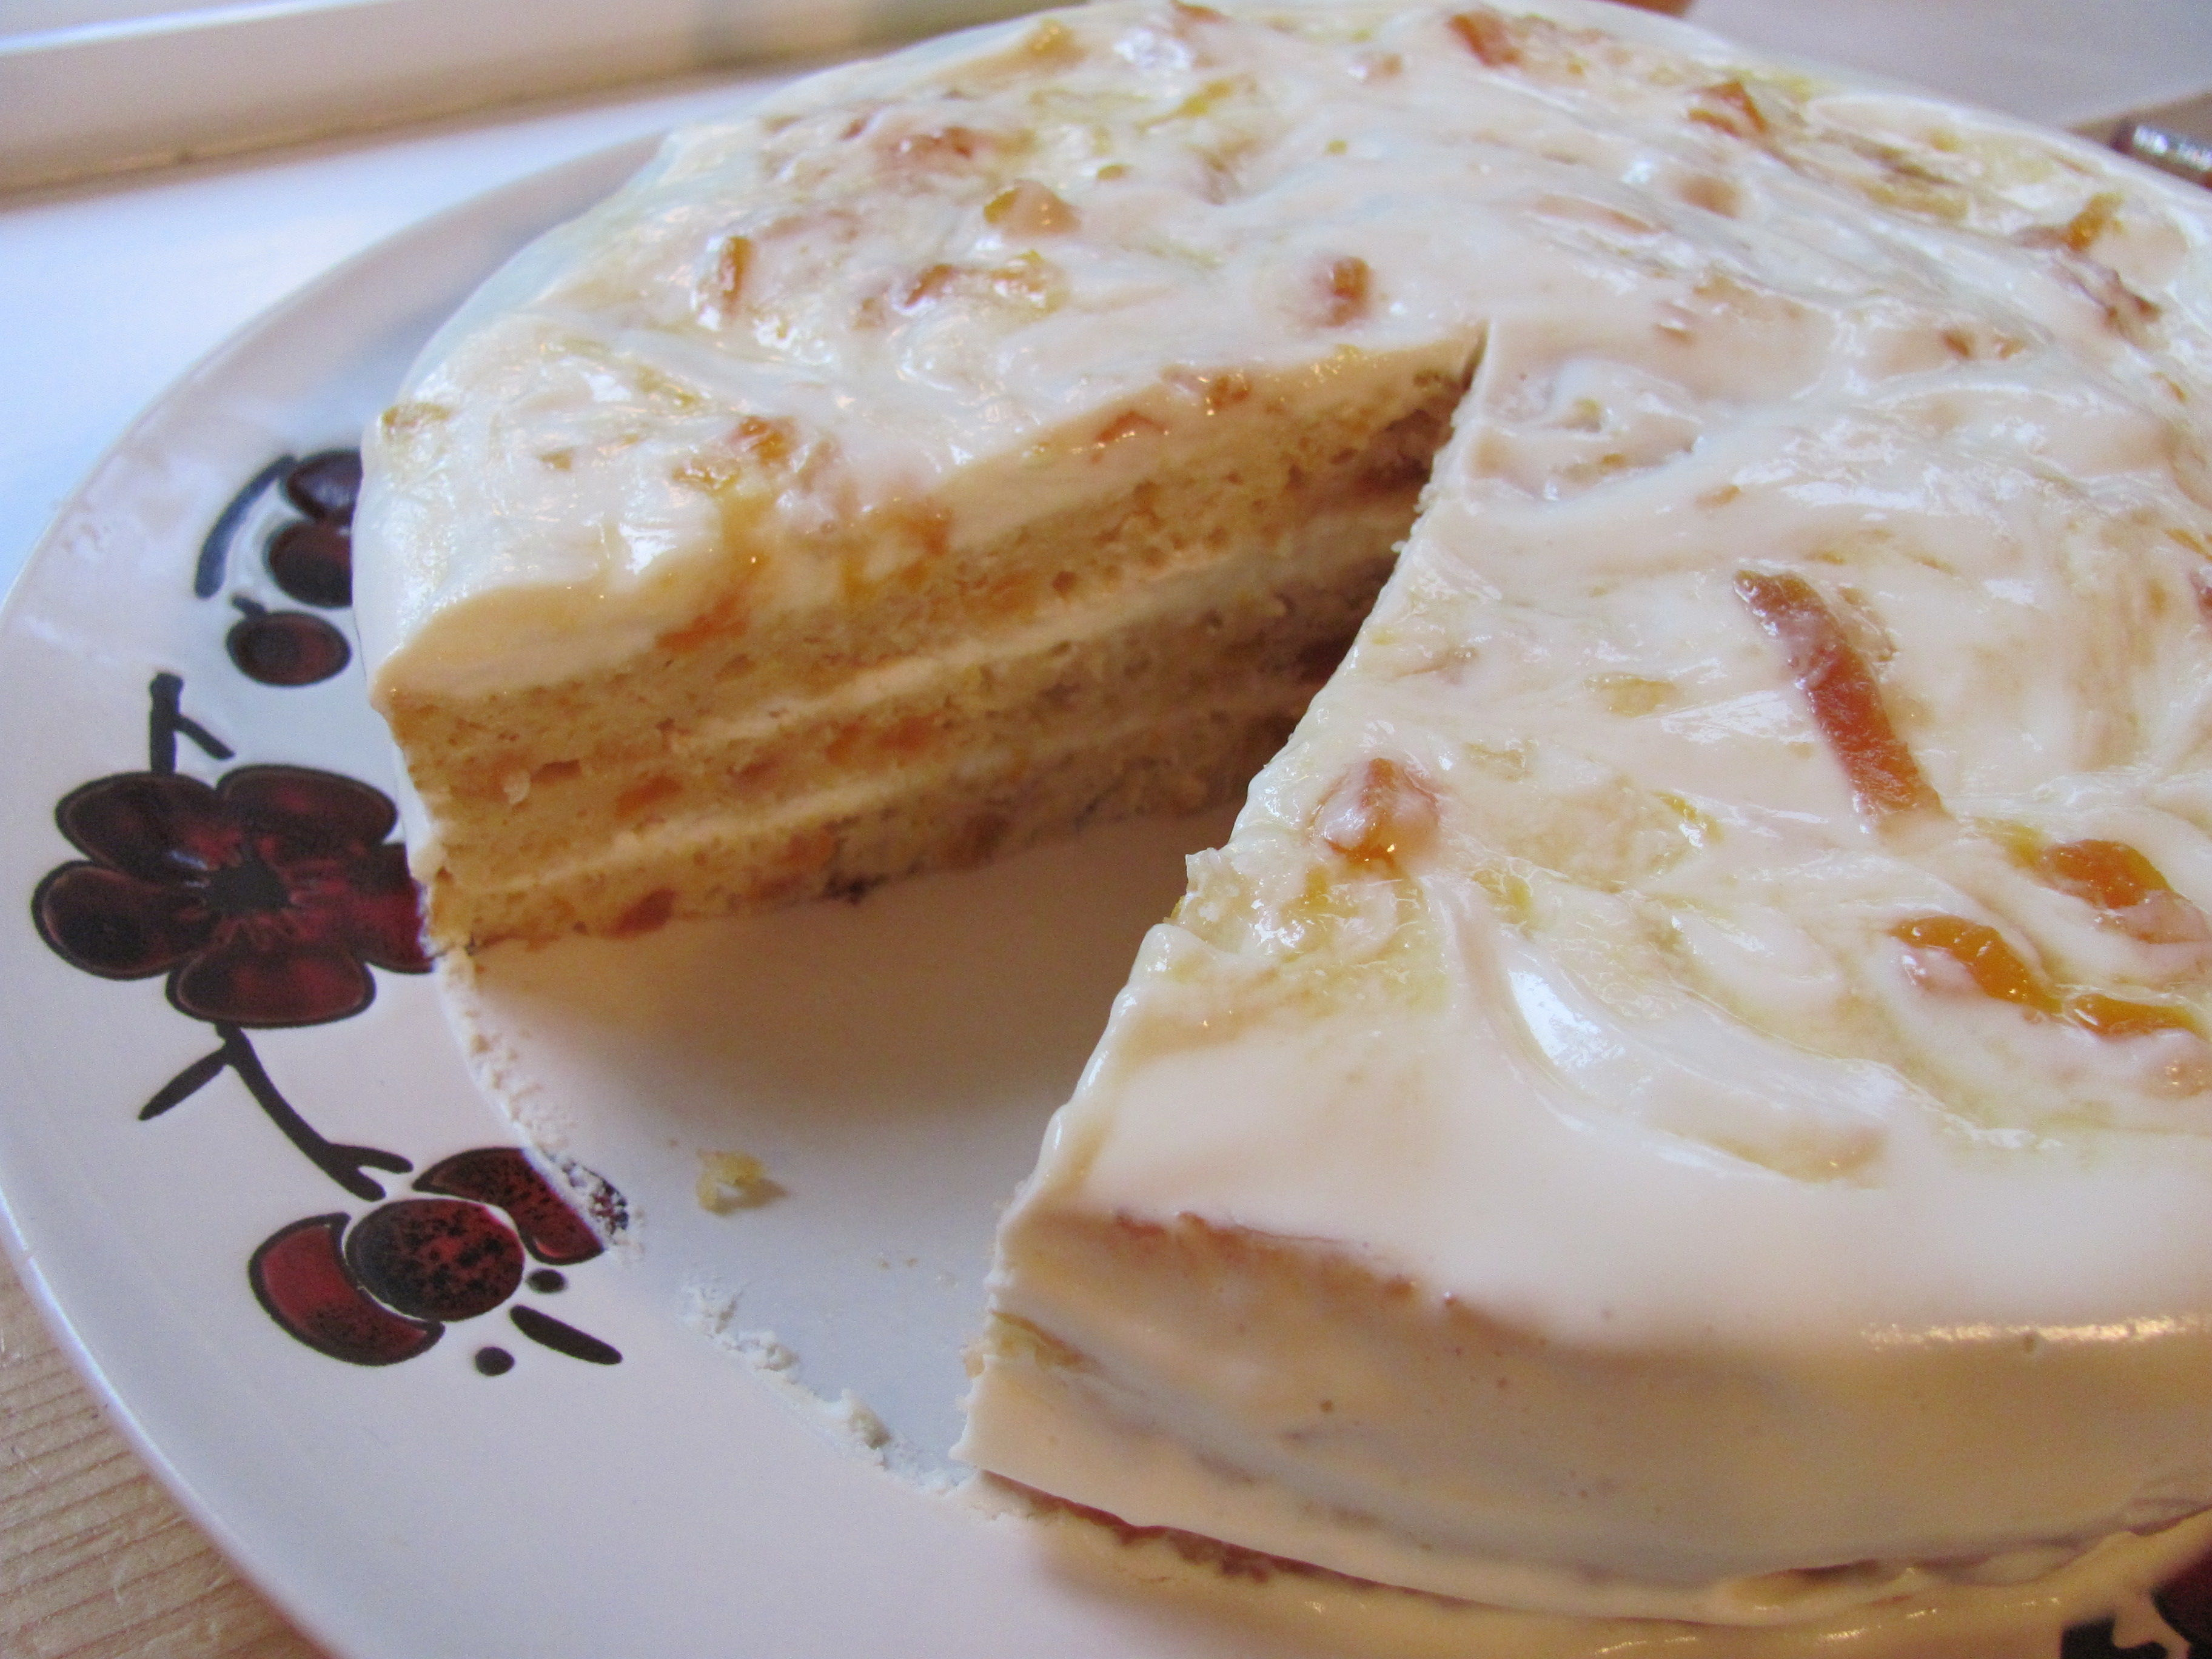 Russian Sour Cream Cake